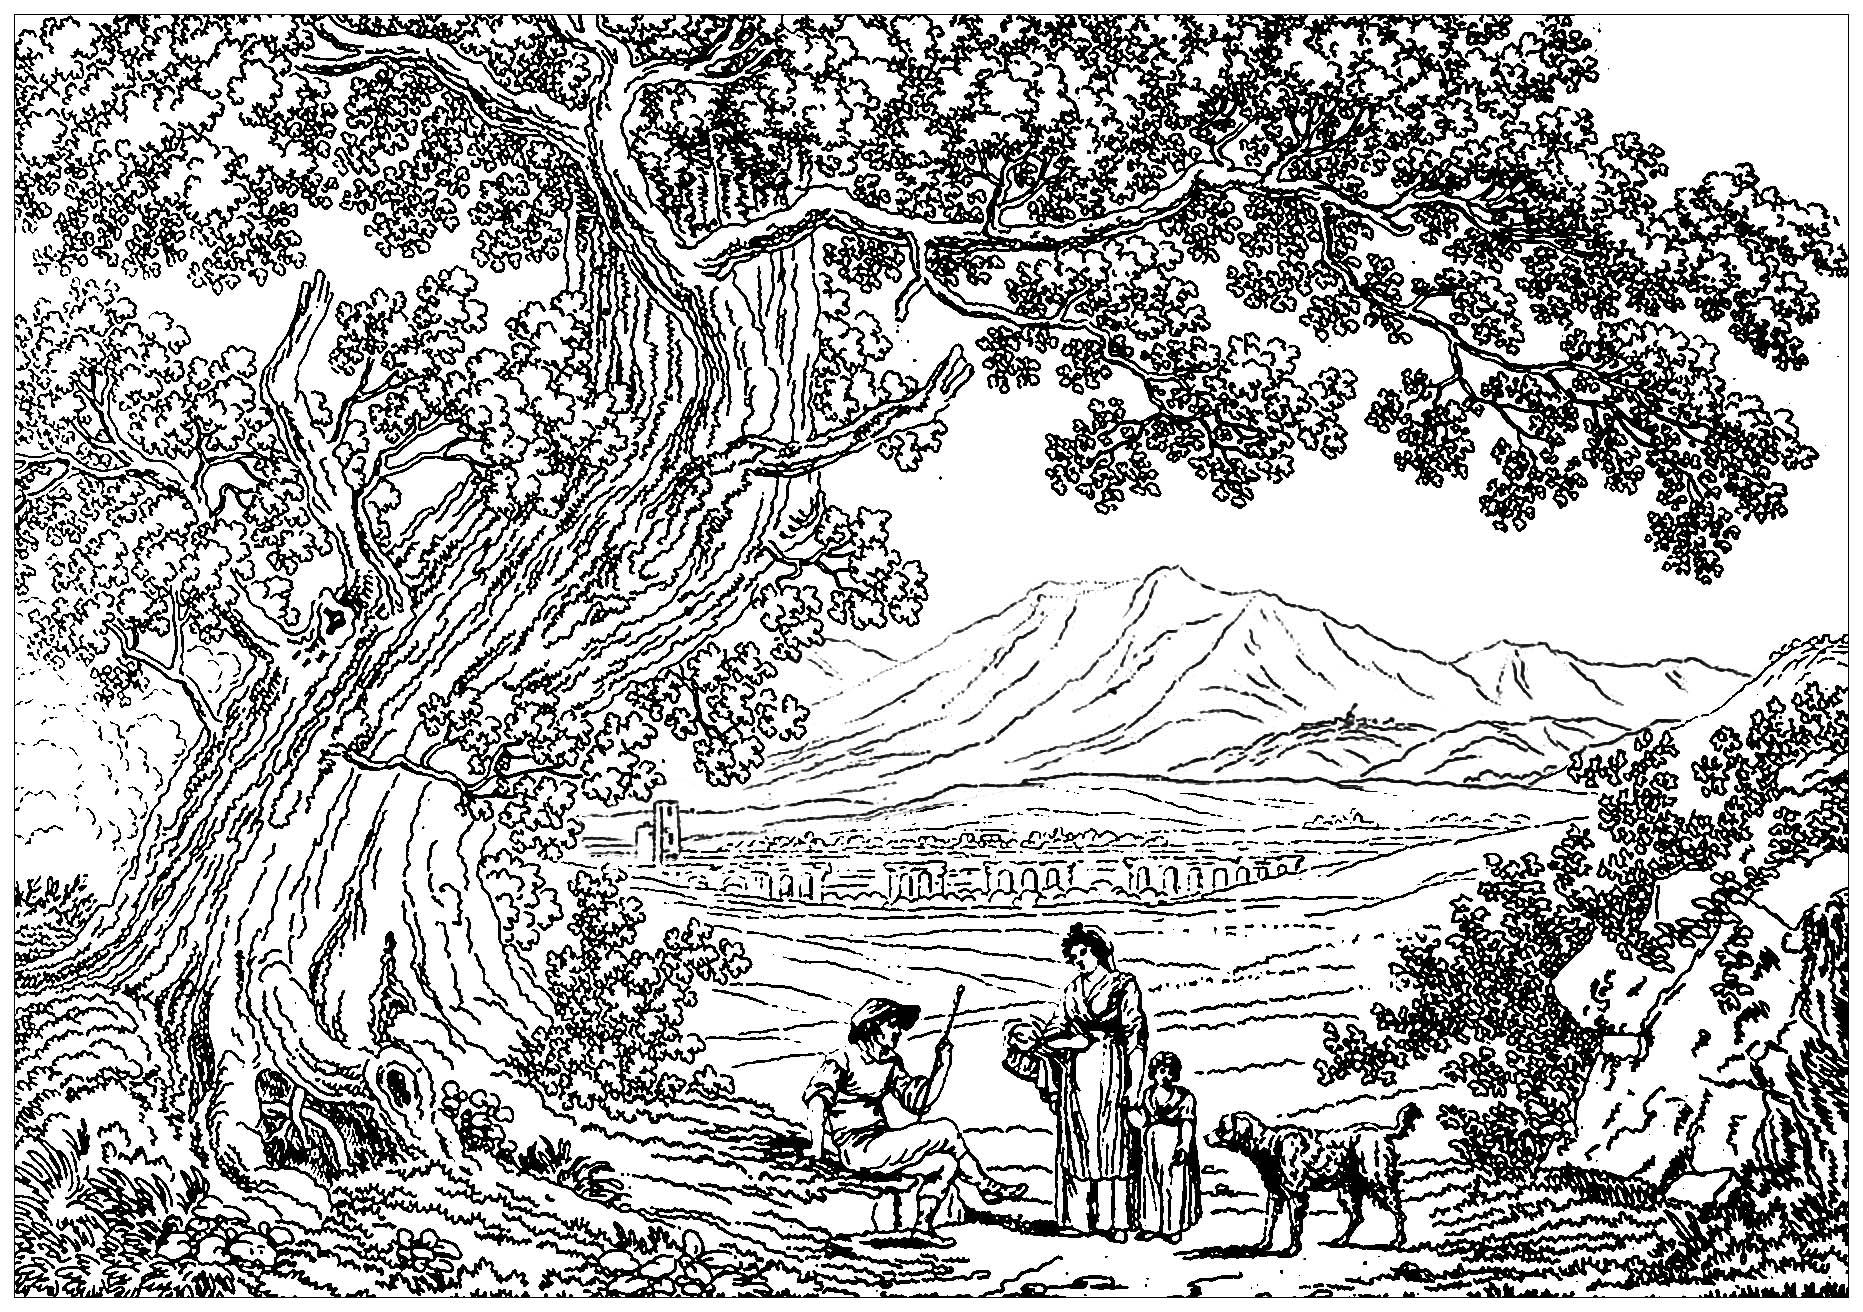 Paysage italie philippe hackert paysages coloriages - Dessin a colorier paysage ...